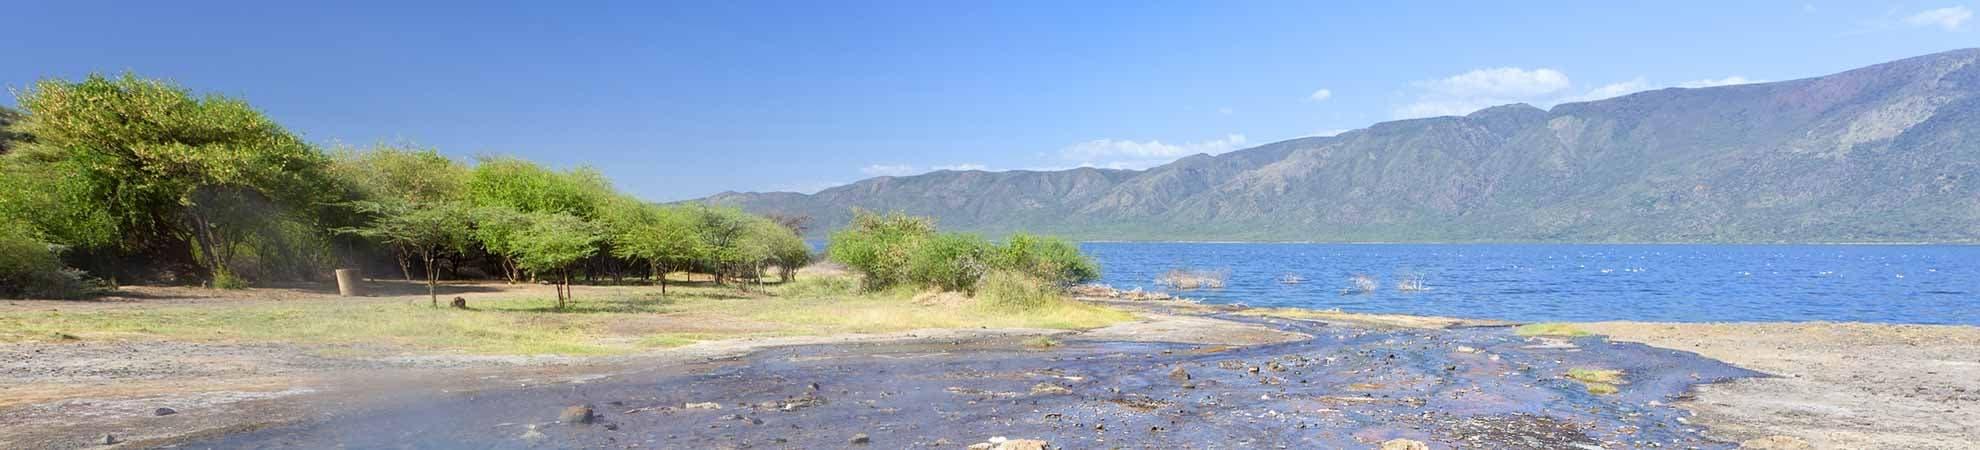 Voyage Rift valley